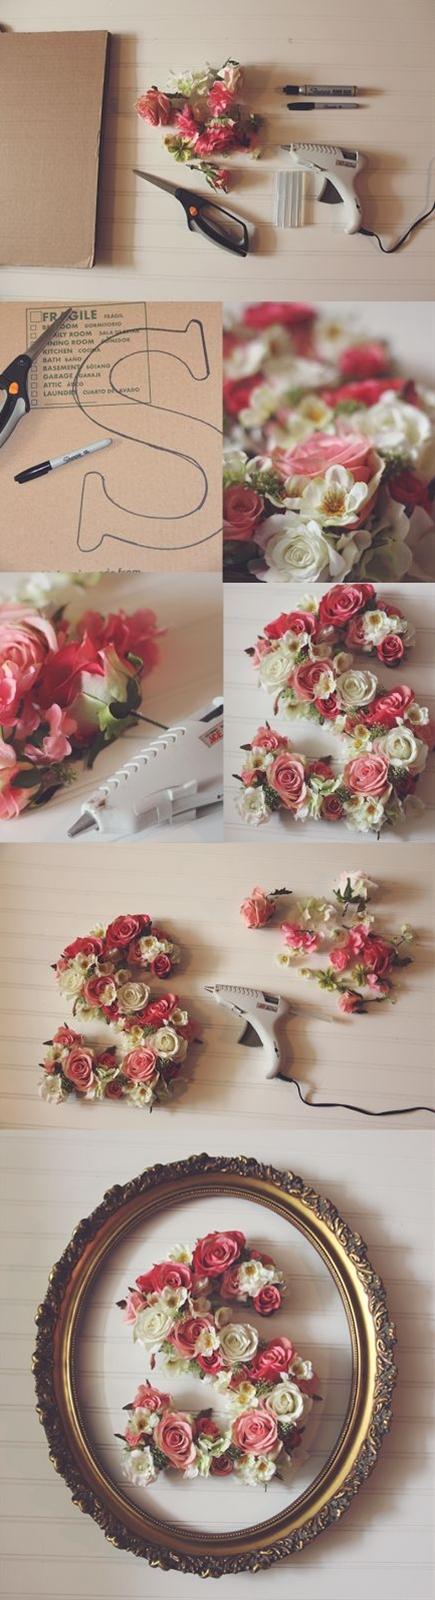 DIY Flower Monogram | Perfect wedding monogram idea!